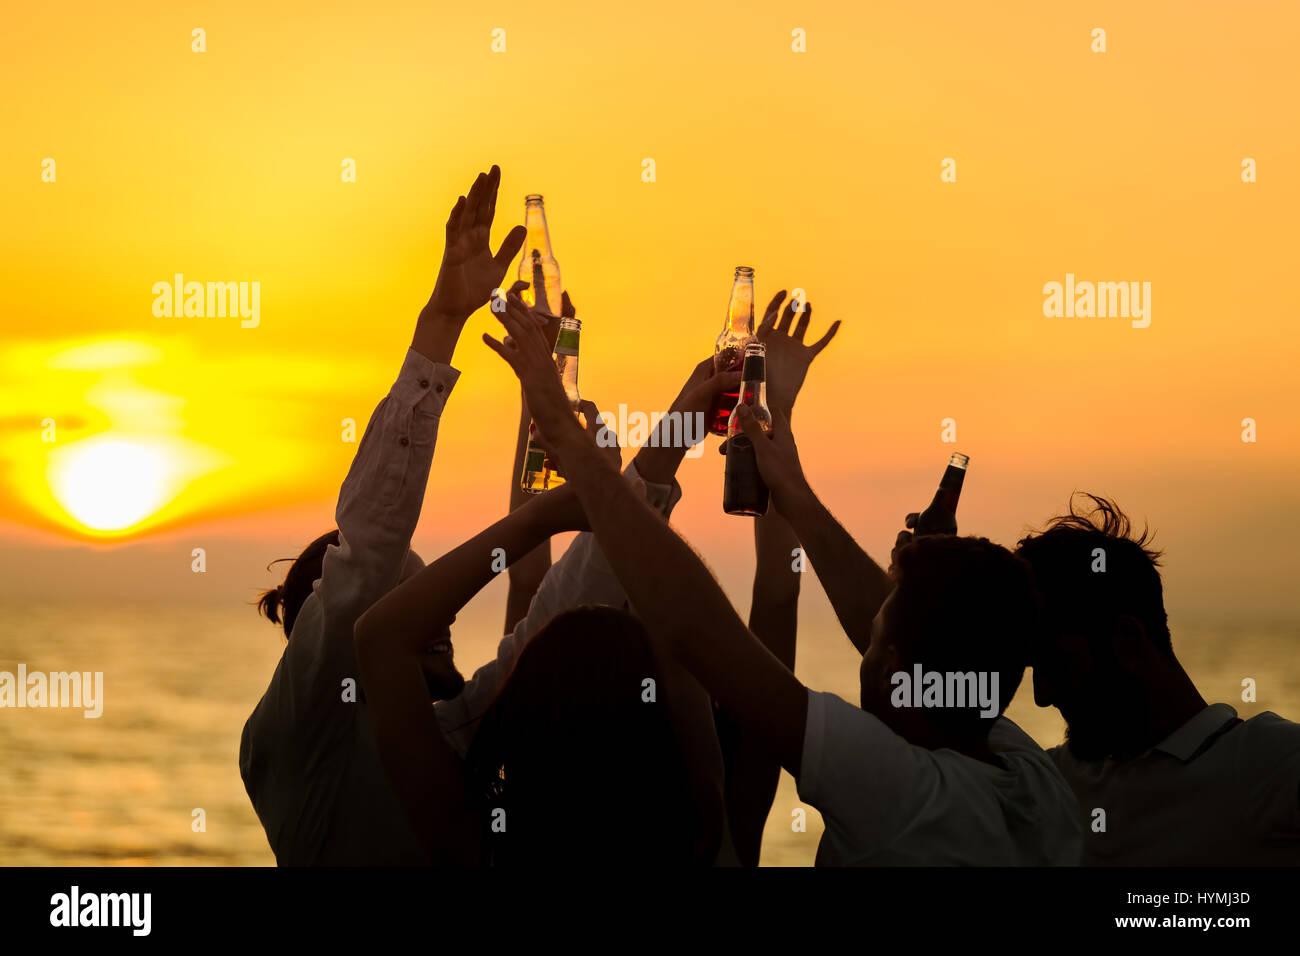 Amigos bebidas Beach Party brindis celebración concepto Imagen De Stock